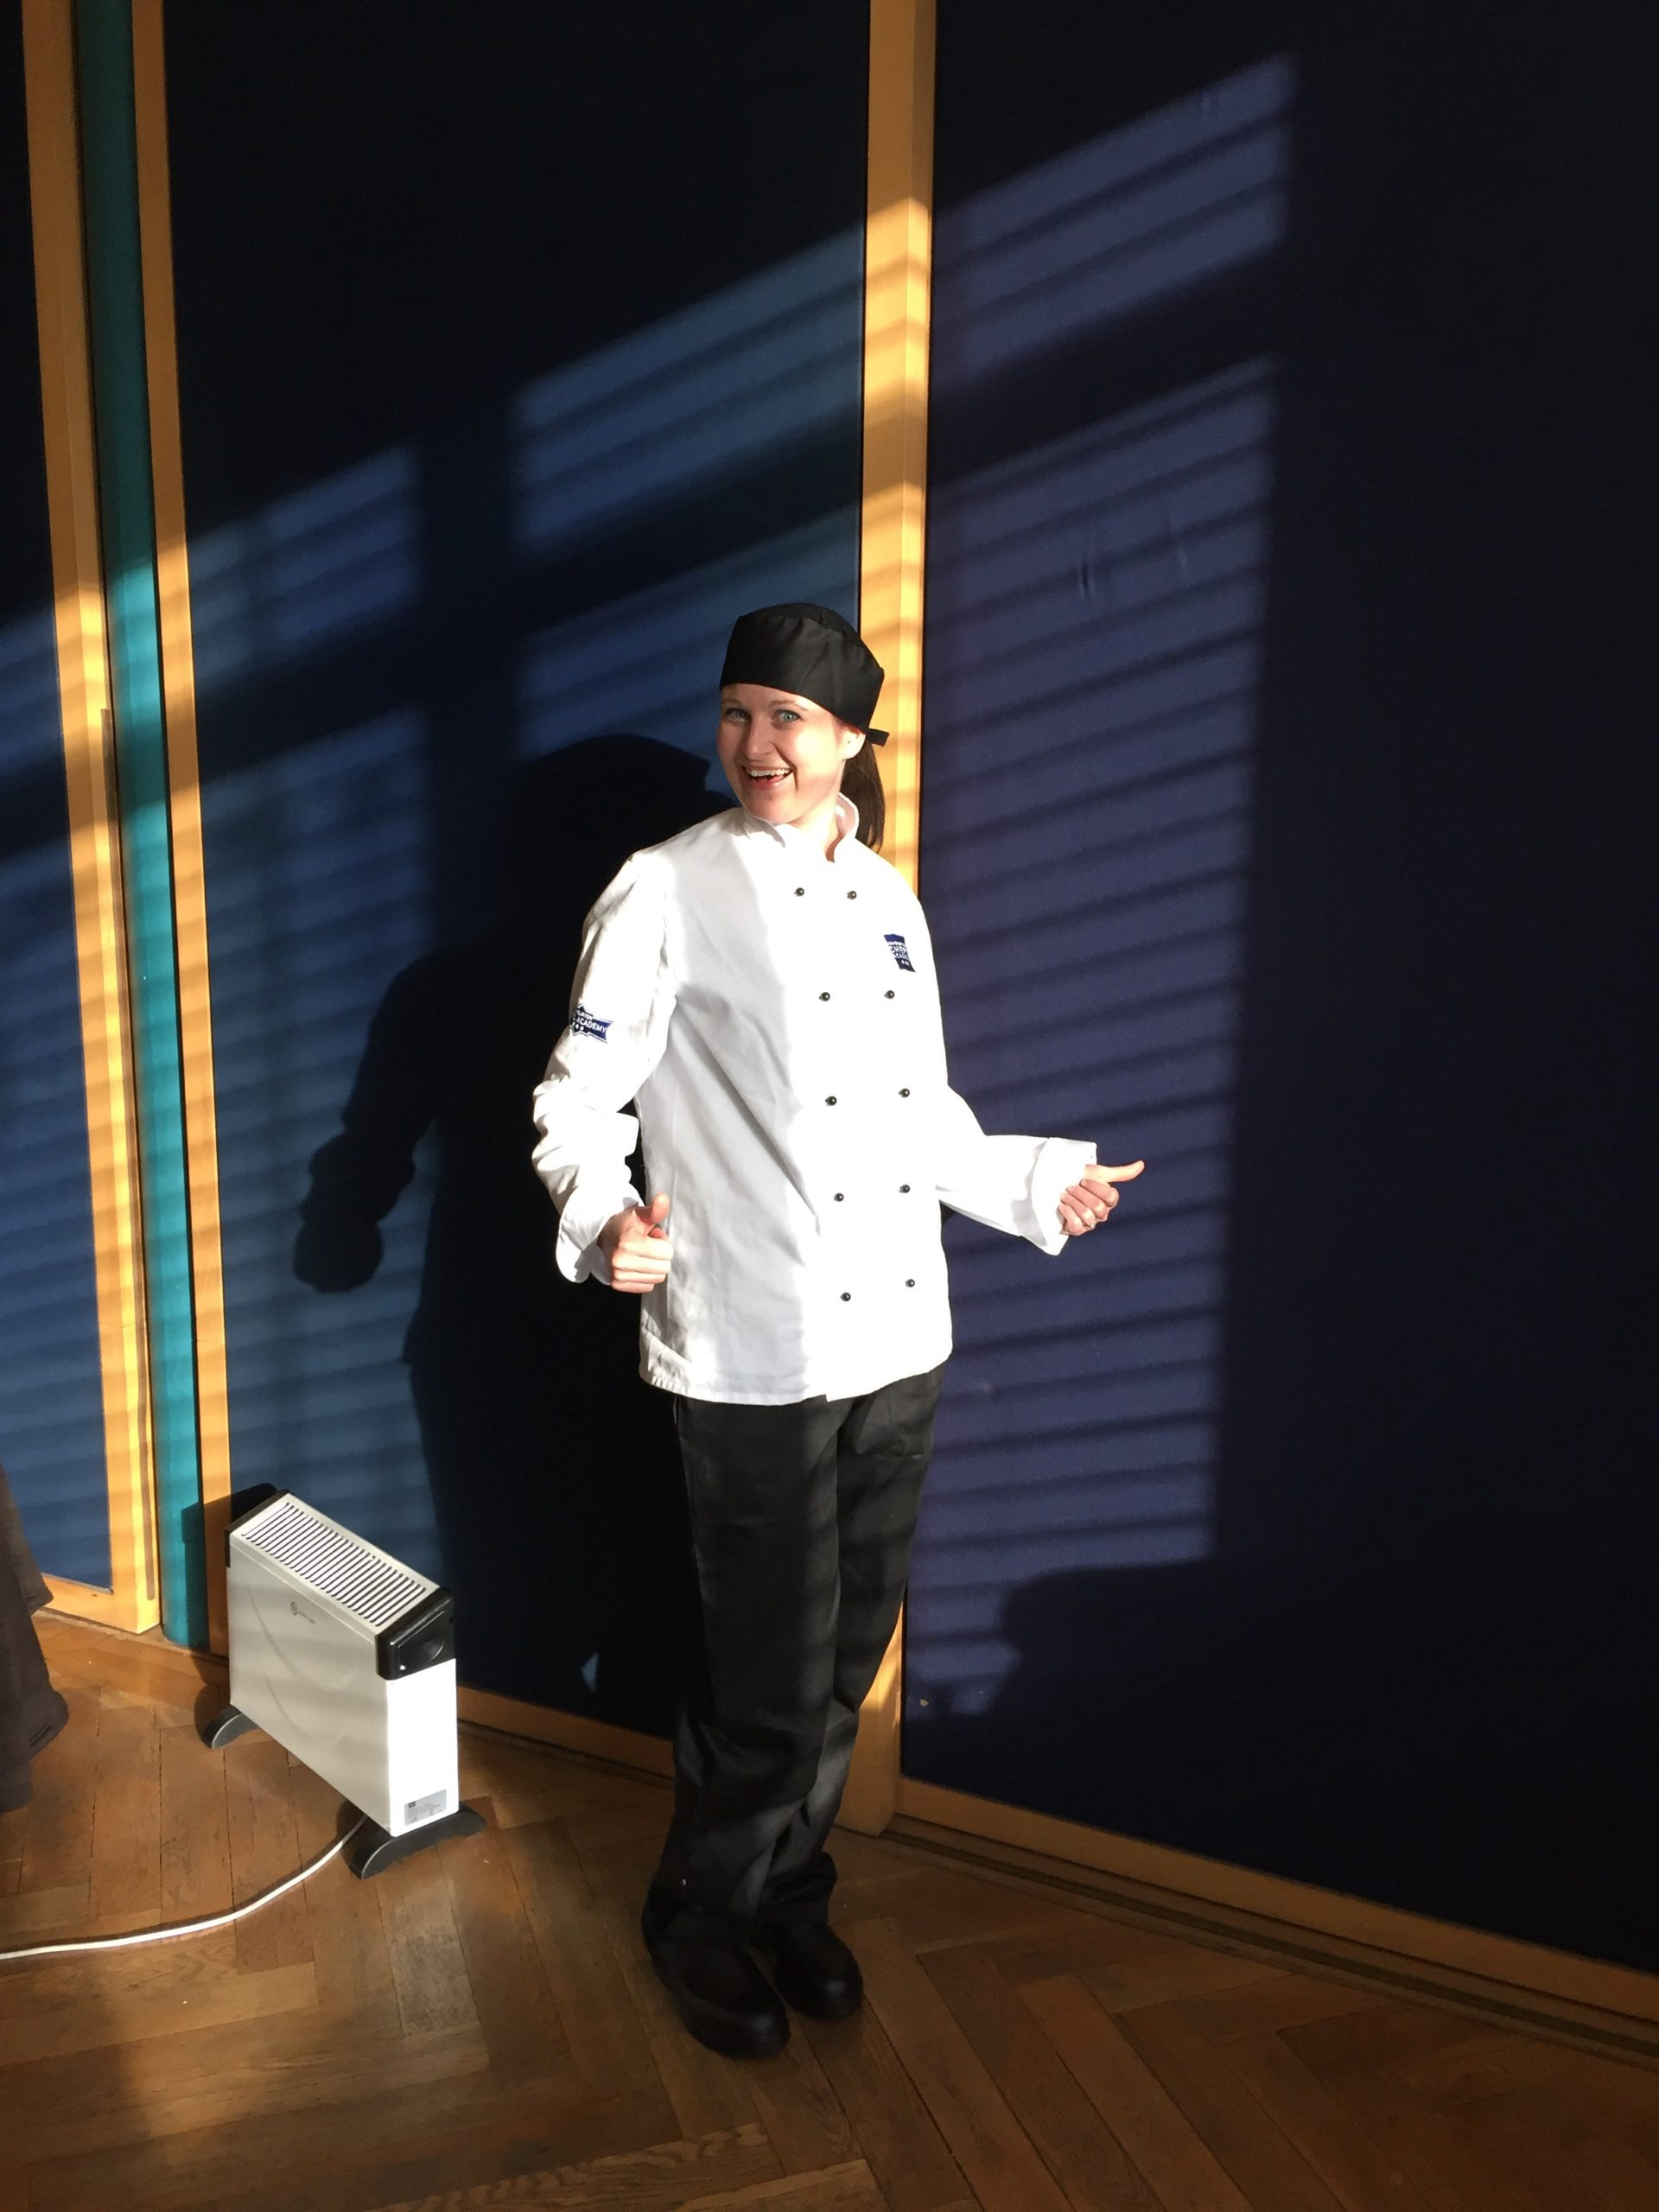 Debbie in chef whites